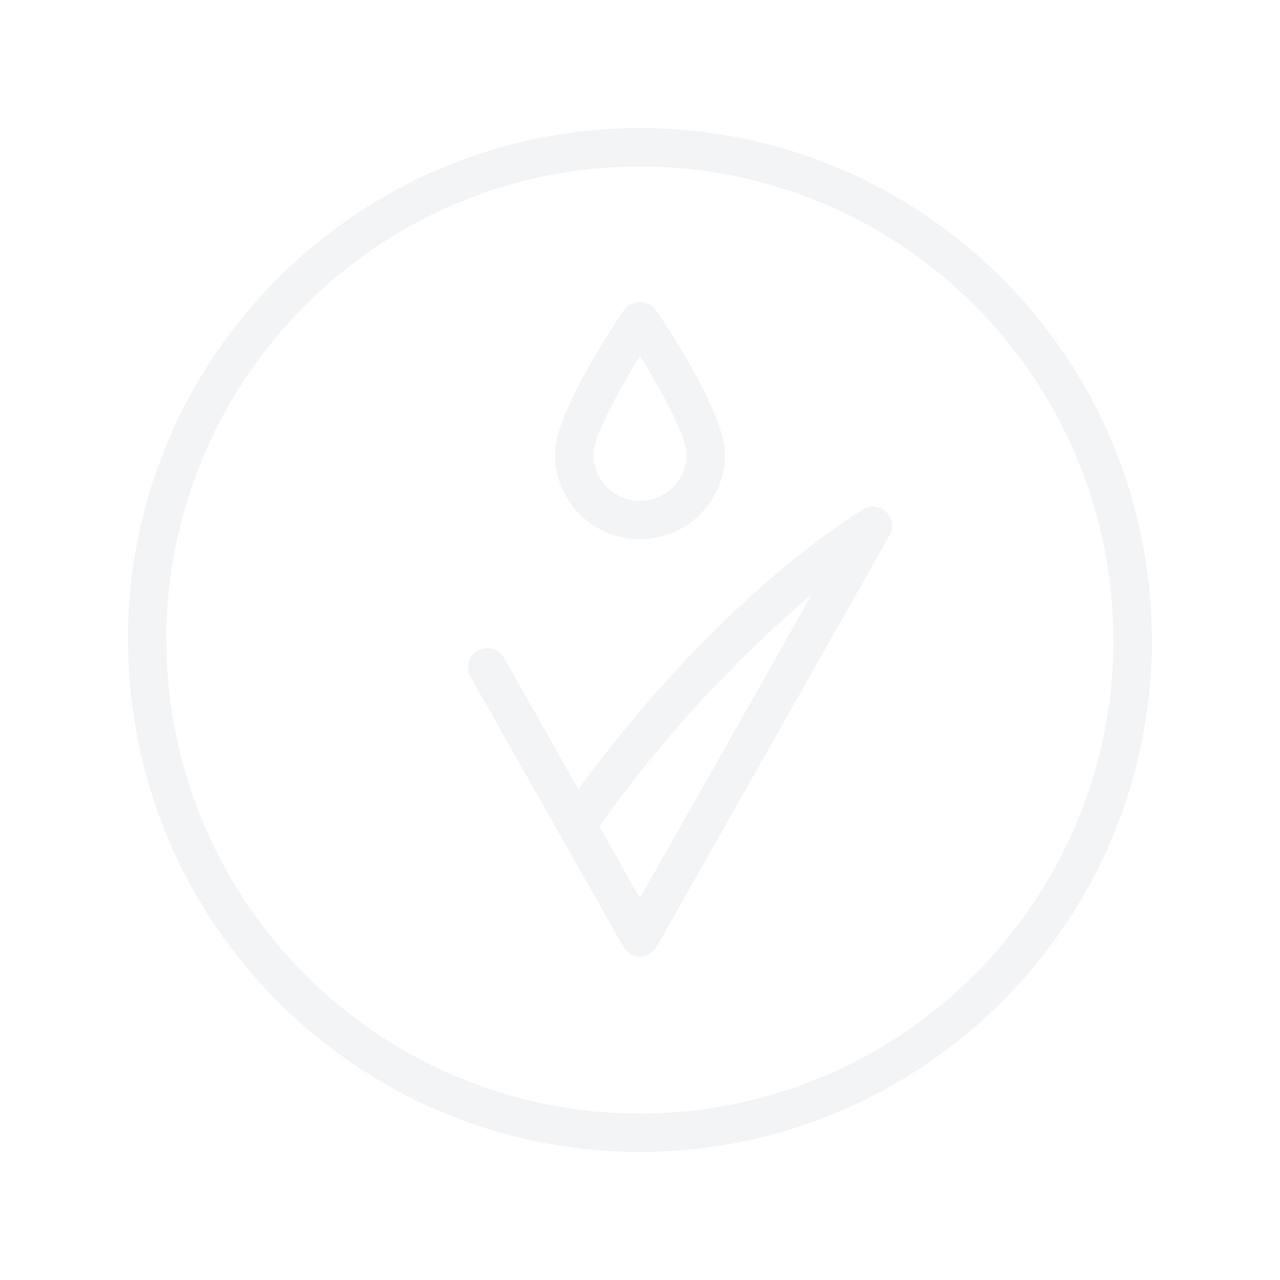 TINTS OF NATURE Henna Cream Light Brown 70ml